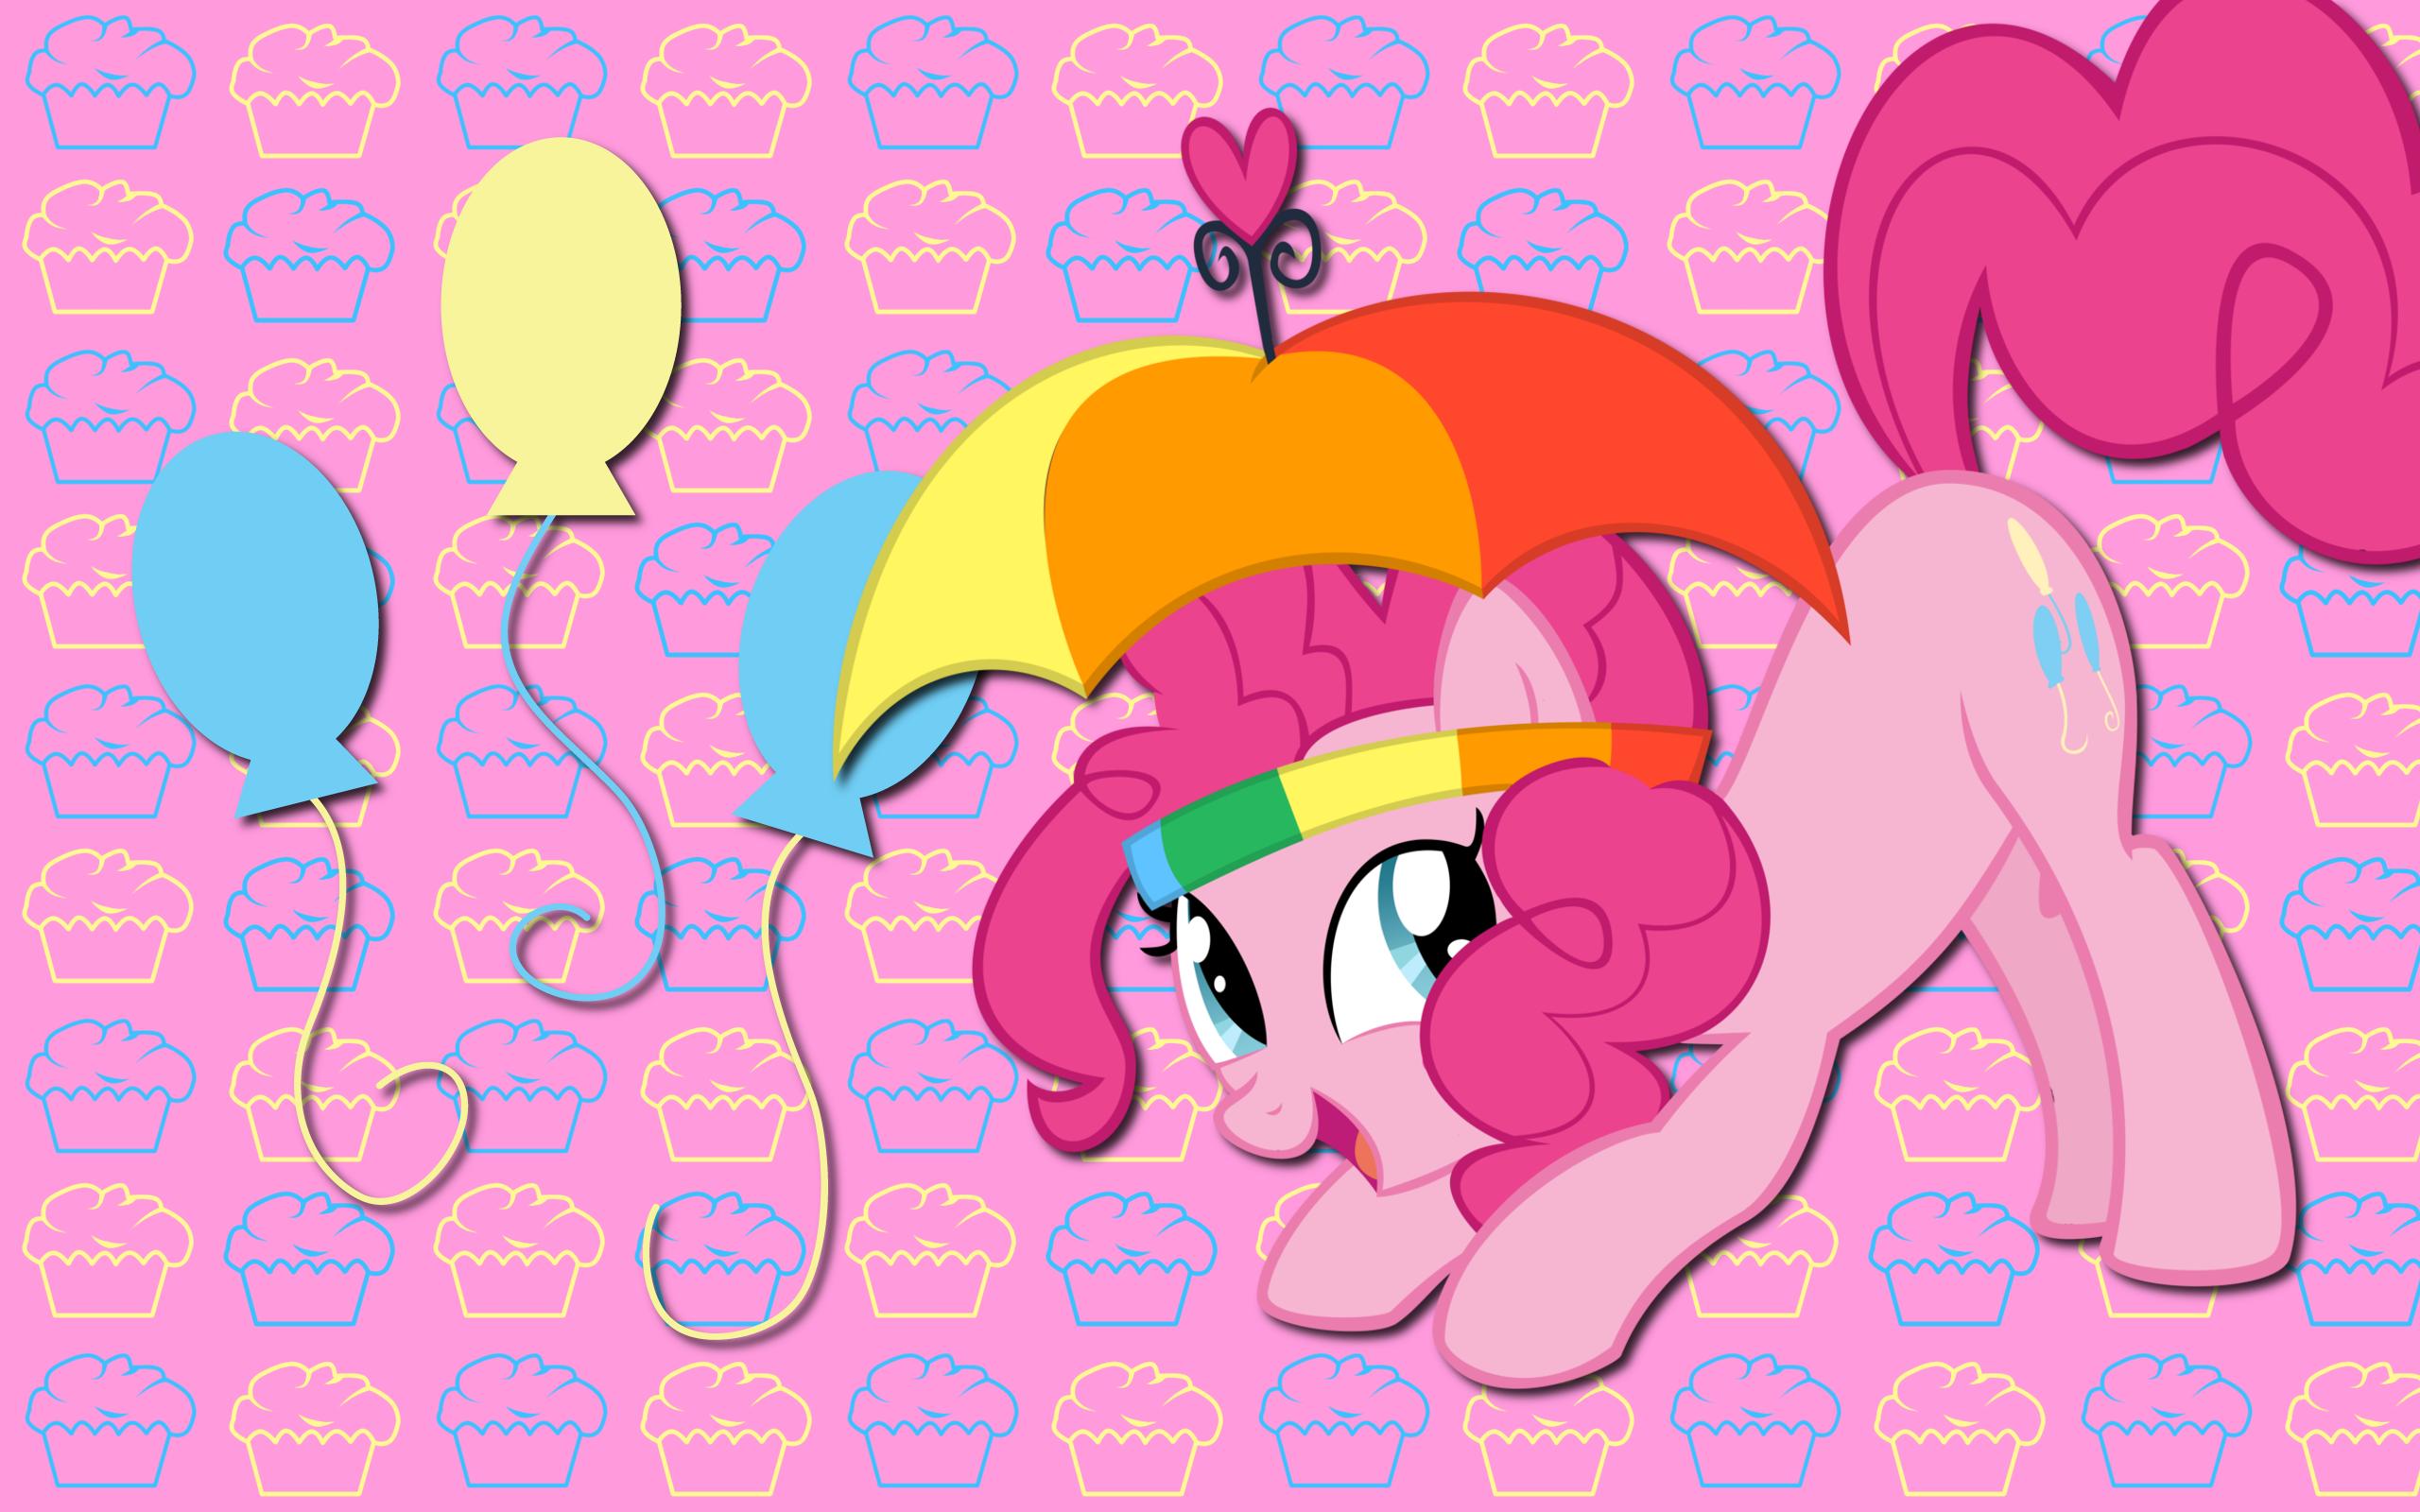 Pinkie Pie wallpaper 10 by AliceHumanSacrifice0, Gratlofatic and ooklah